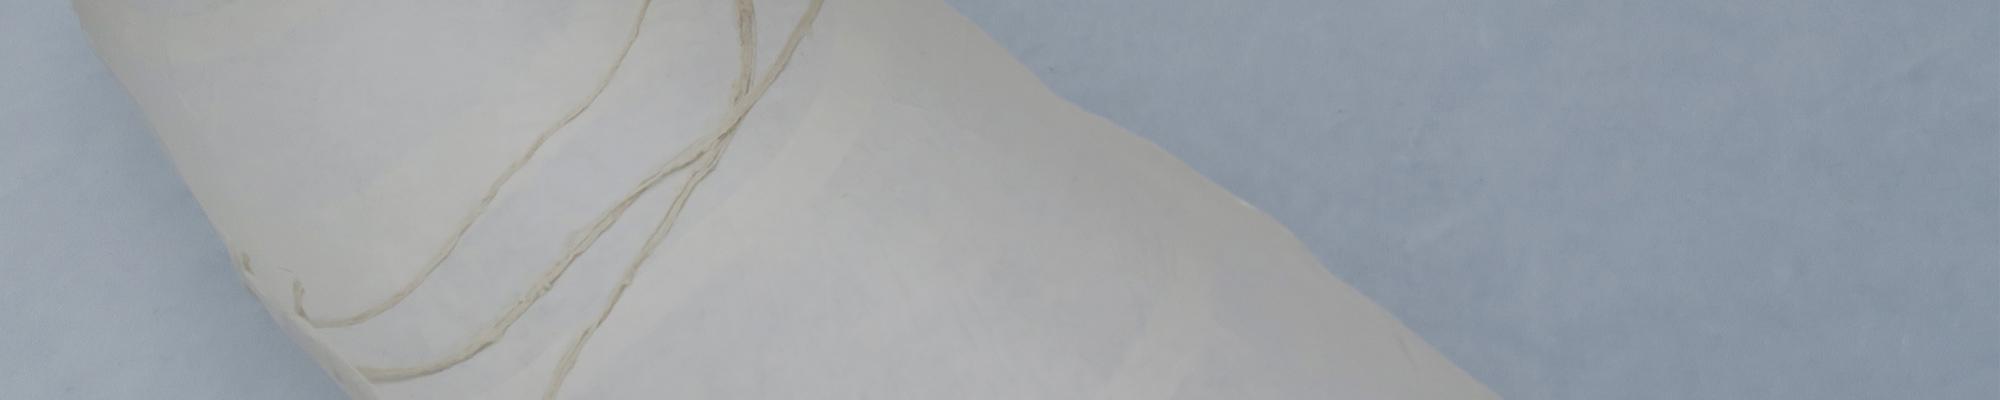 transparante schaal van rijstpapier © 2021 Anne-Riet de Boer